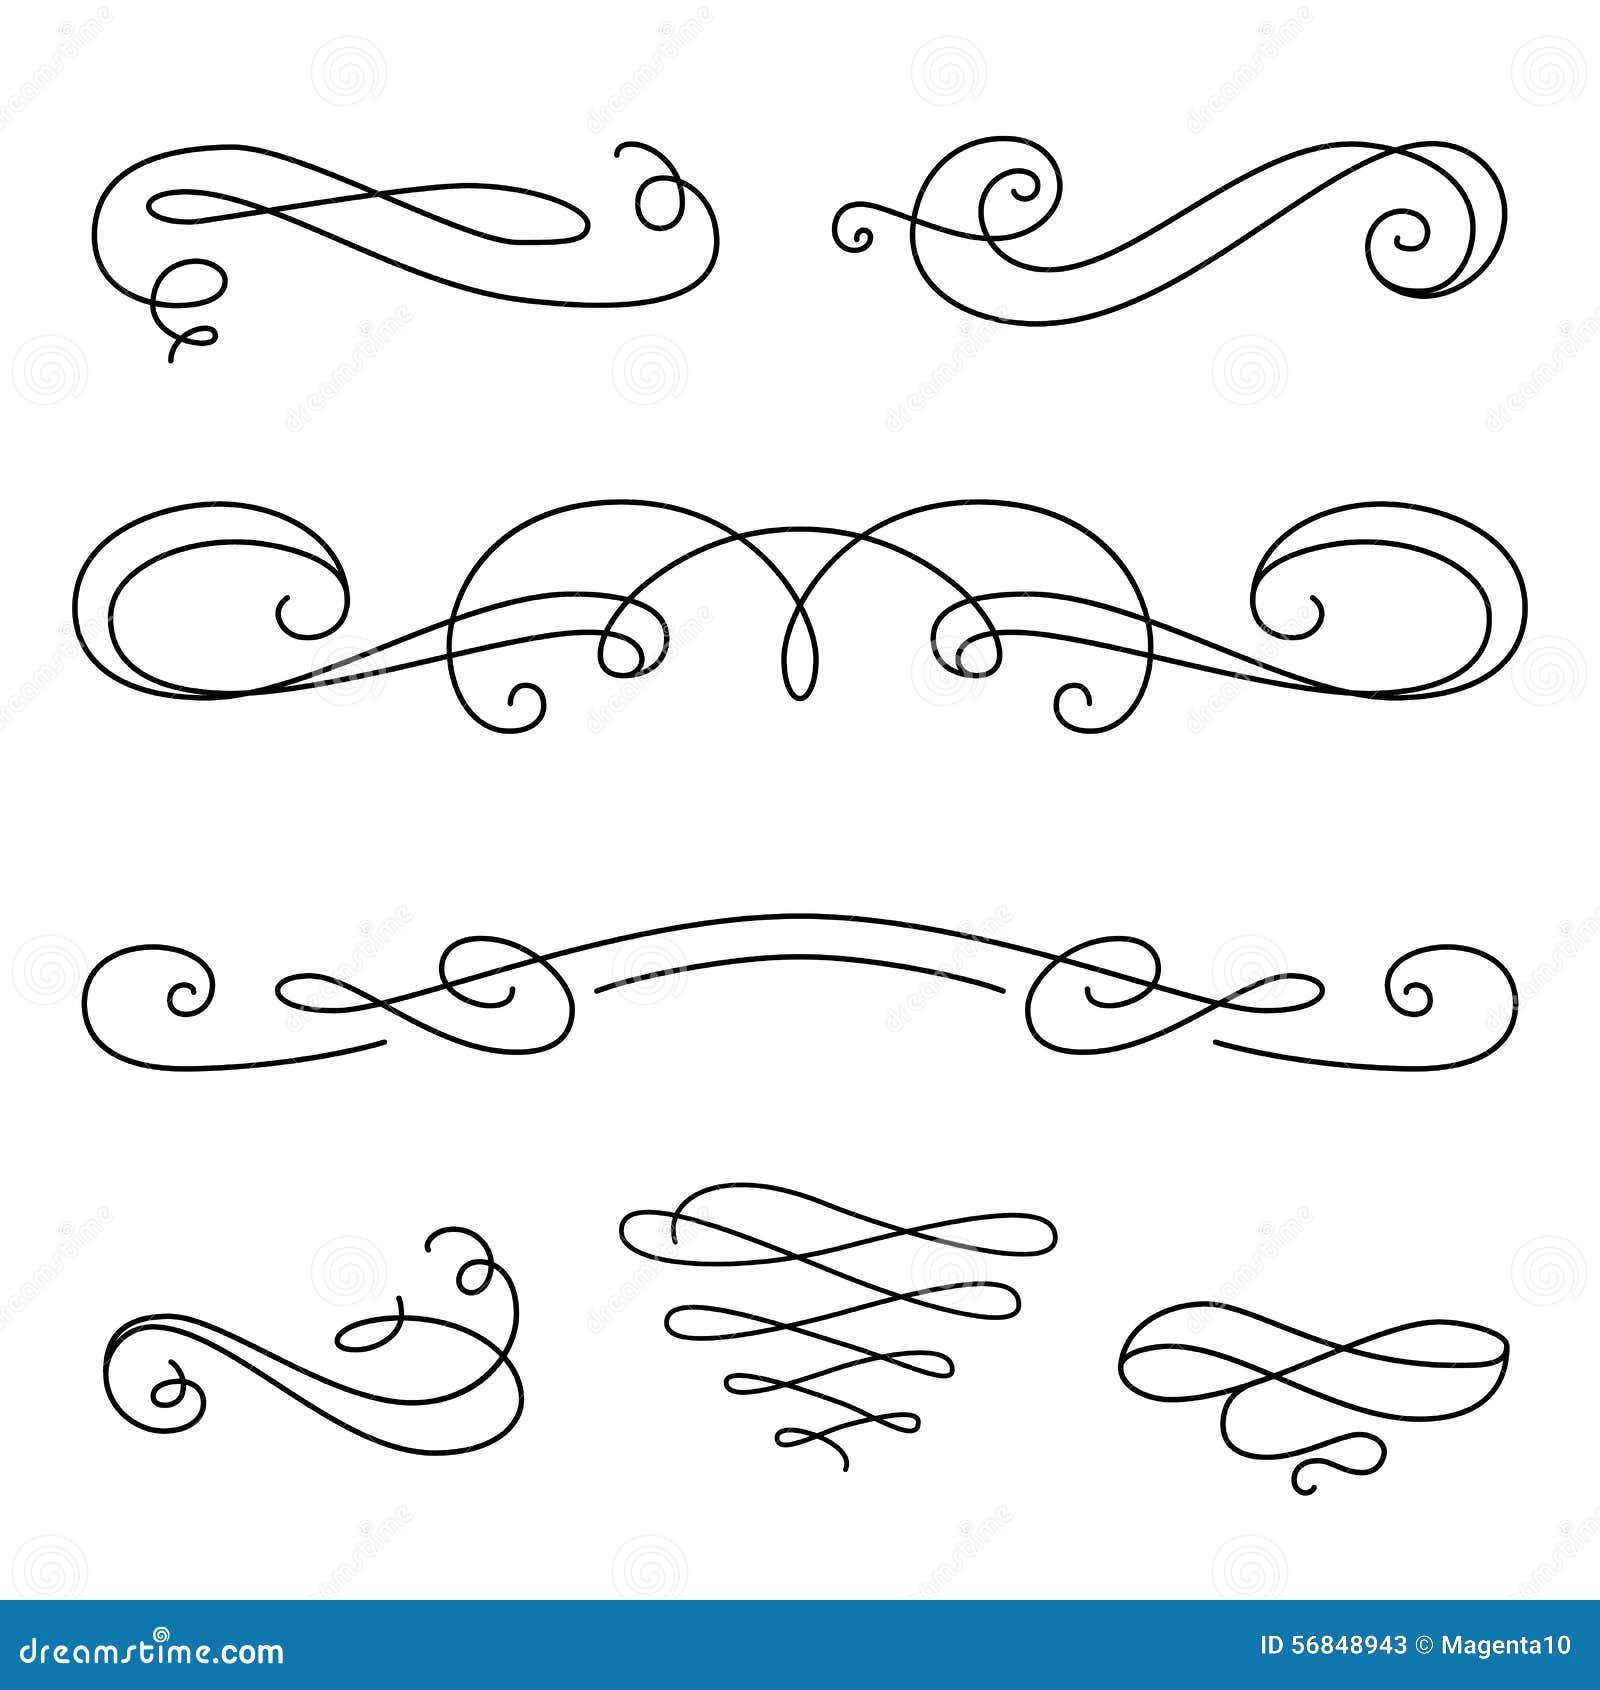 Scroll elements set of vintage calligraphic vignettes